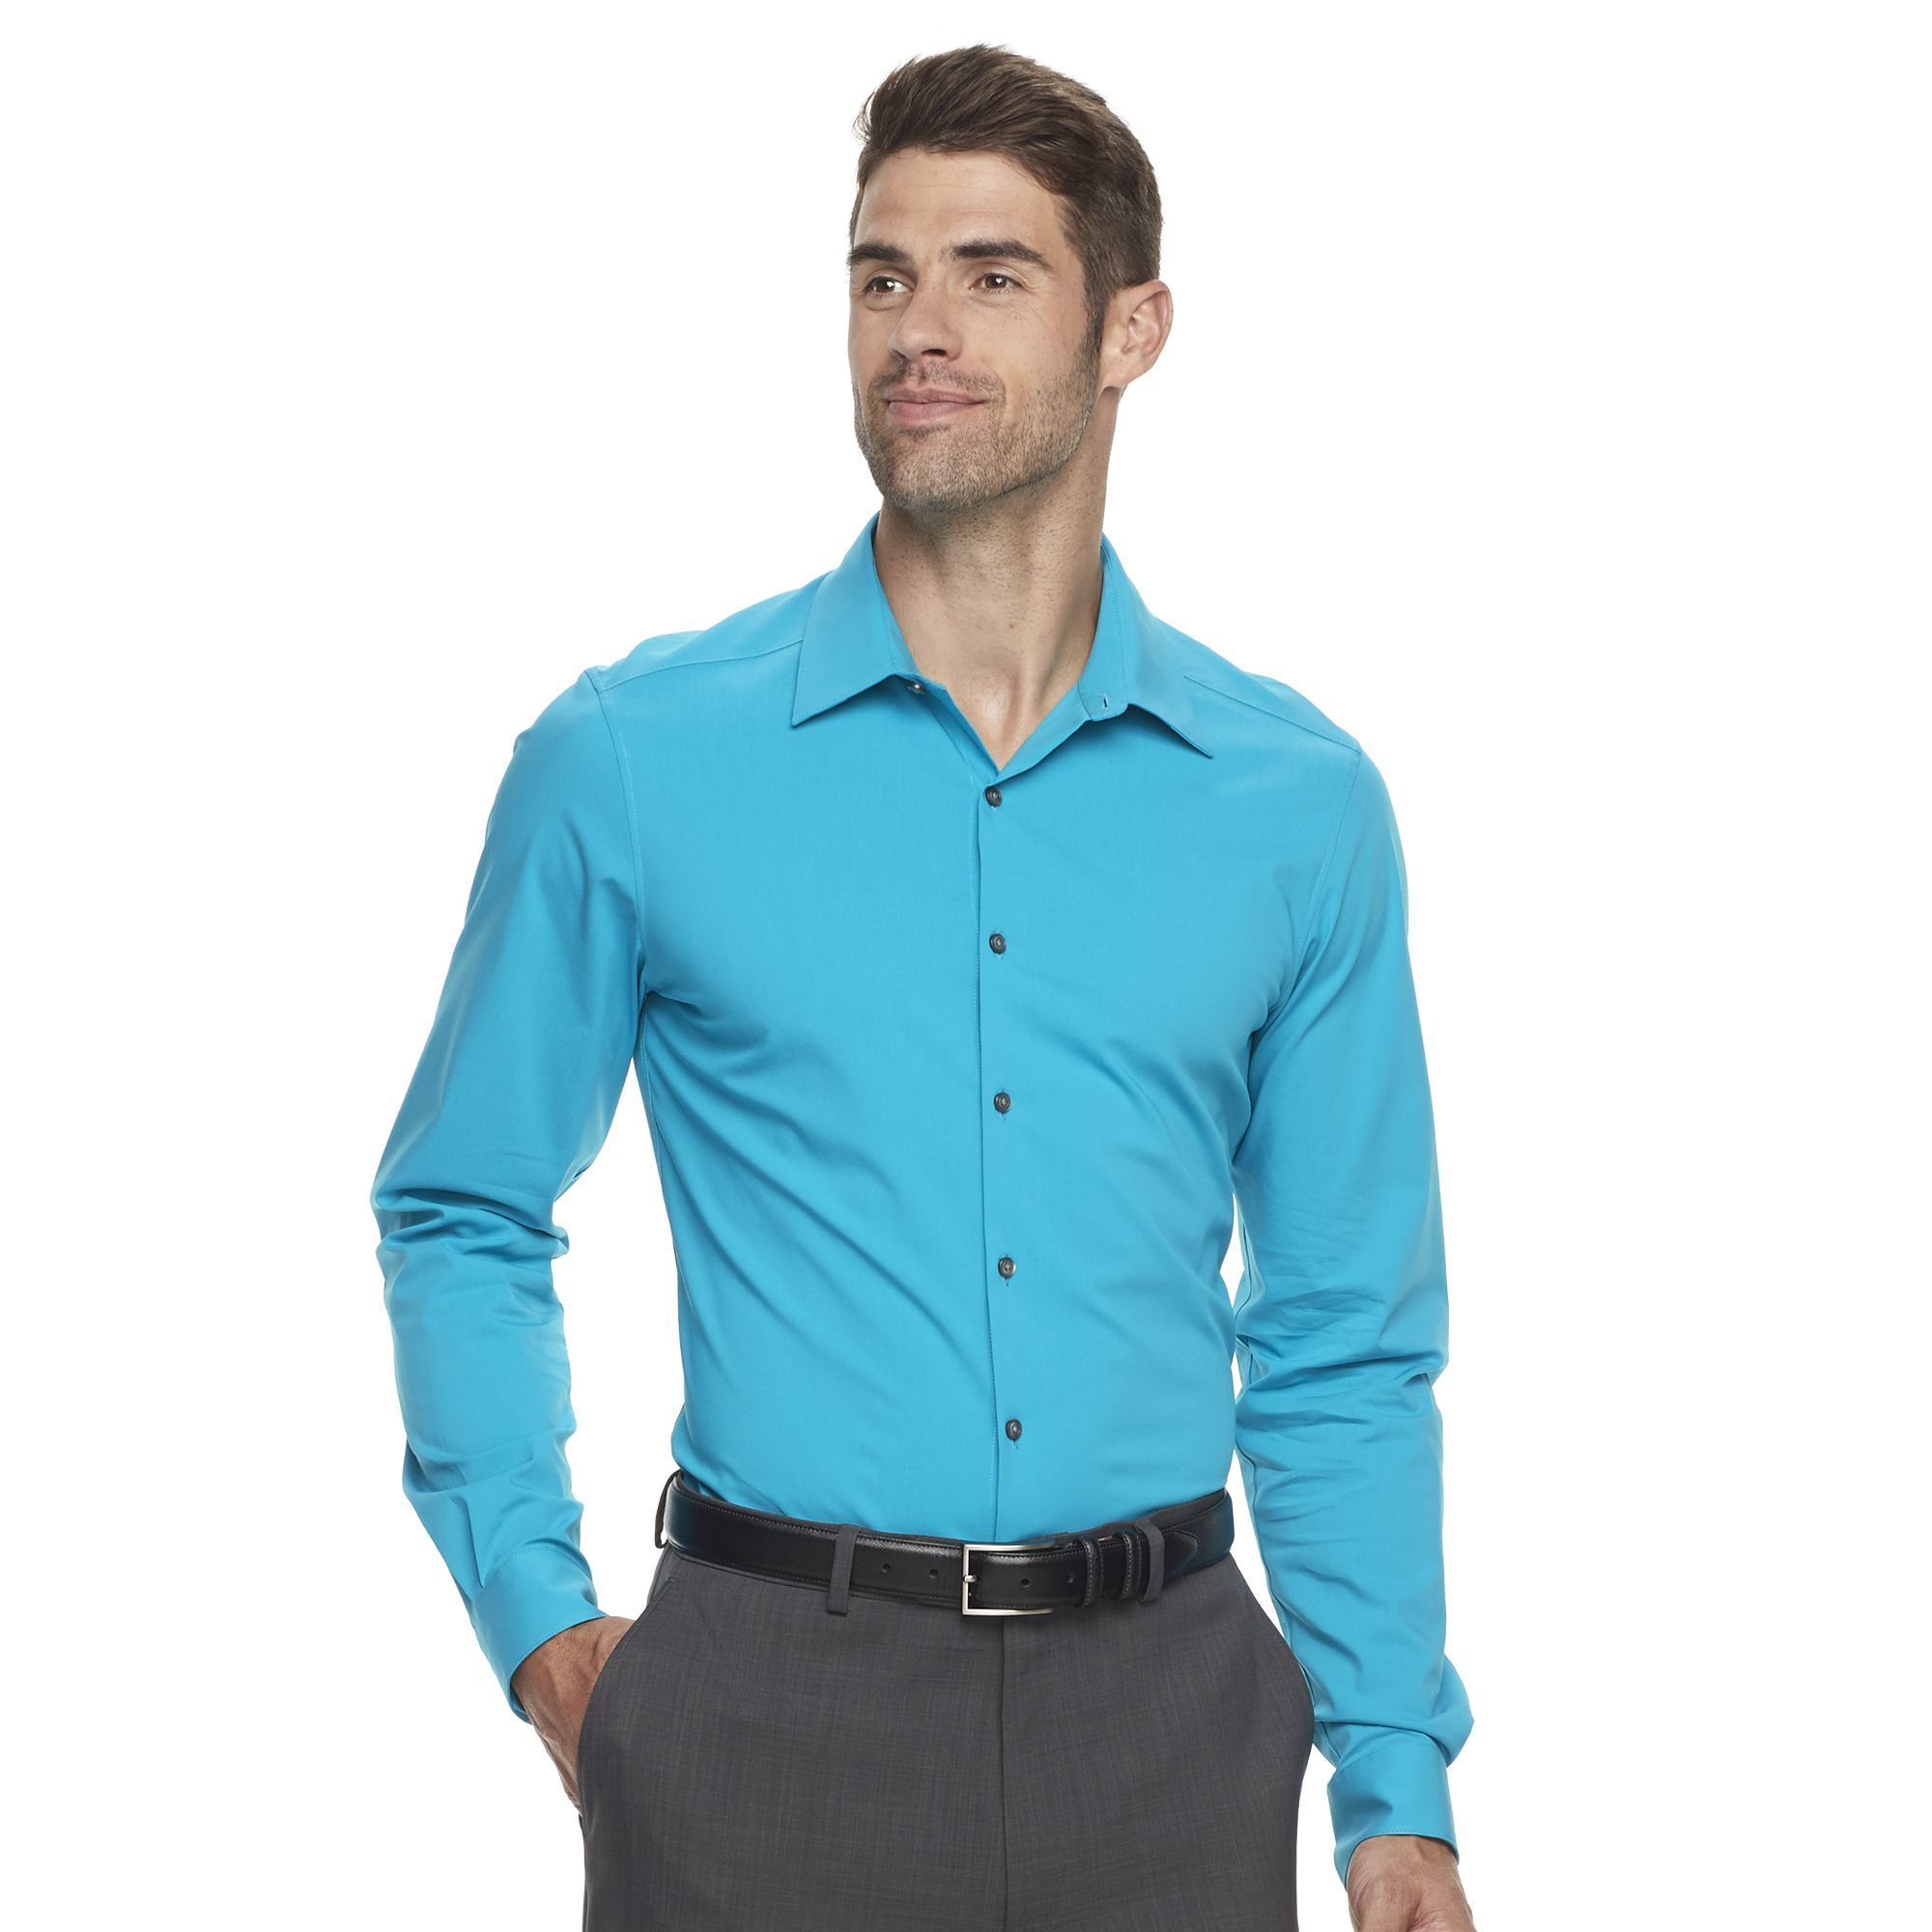 Men's Van Heusen Flex 3 Slim Fit 4-Way Stretch Dress Shirt, Size ...